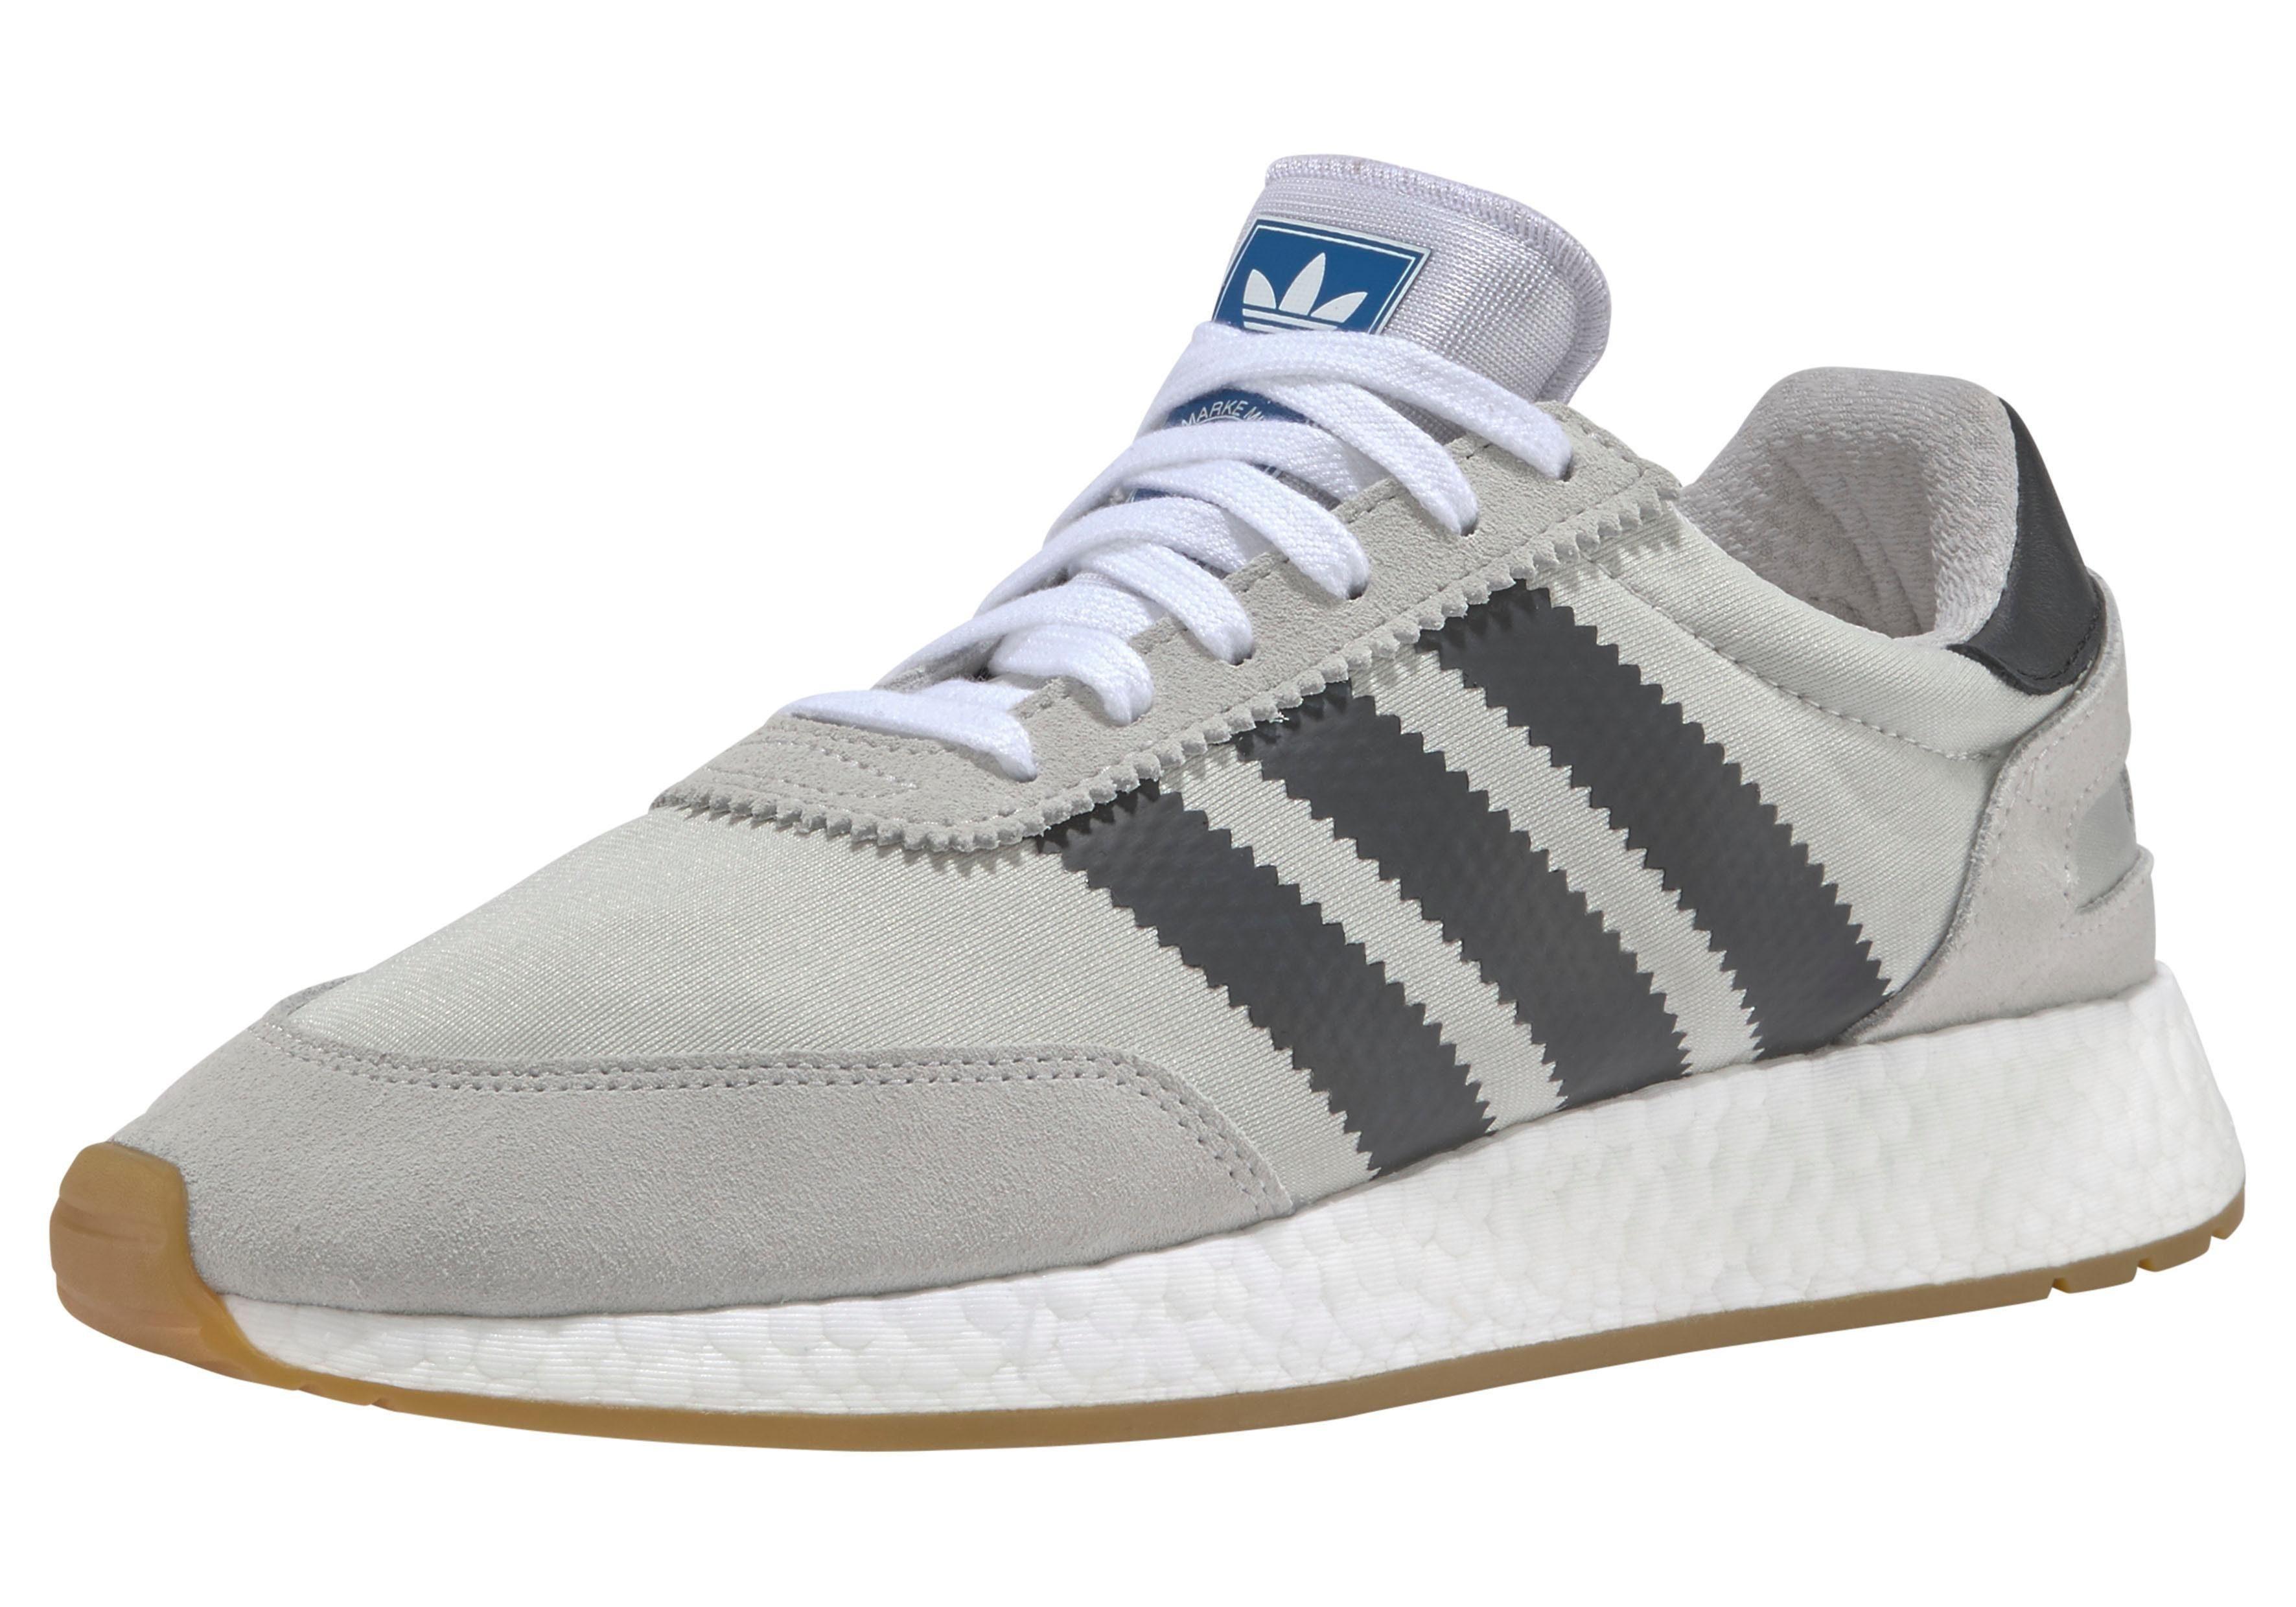 sneakers »I 5923«